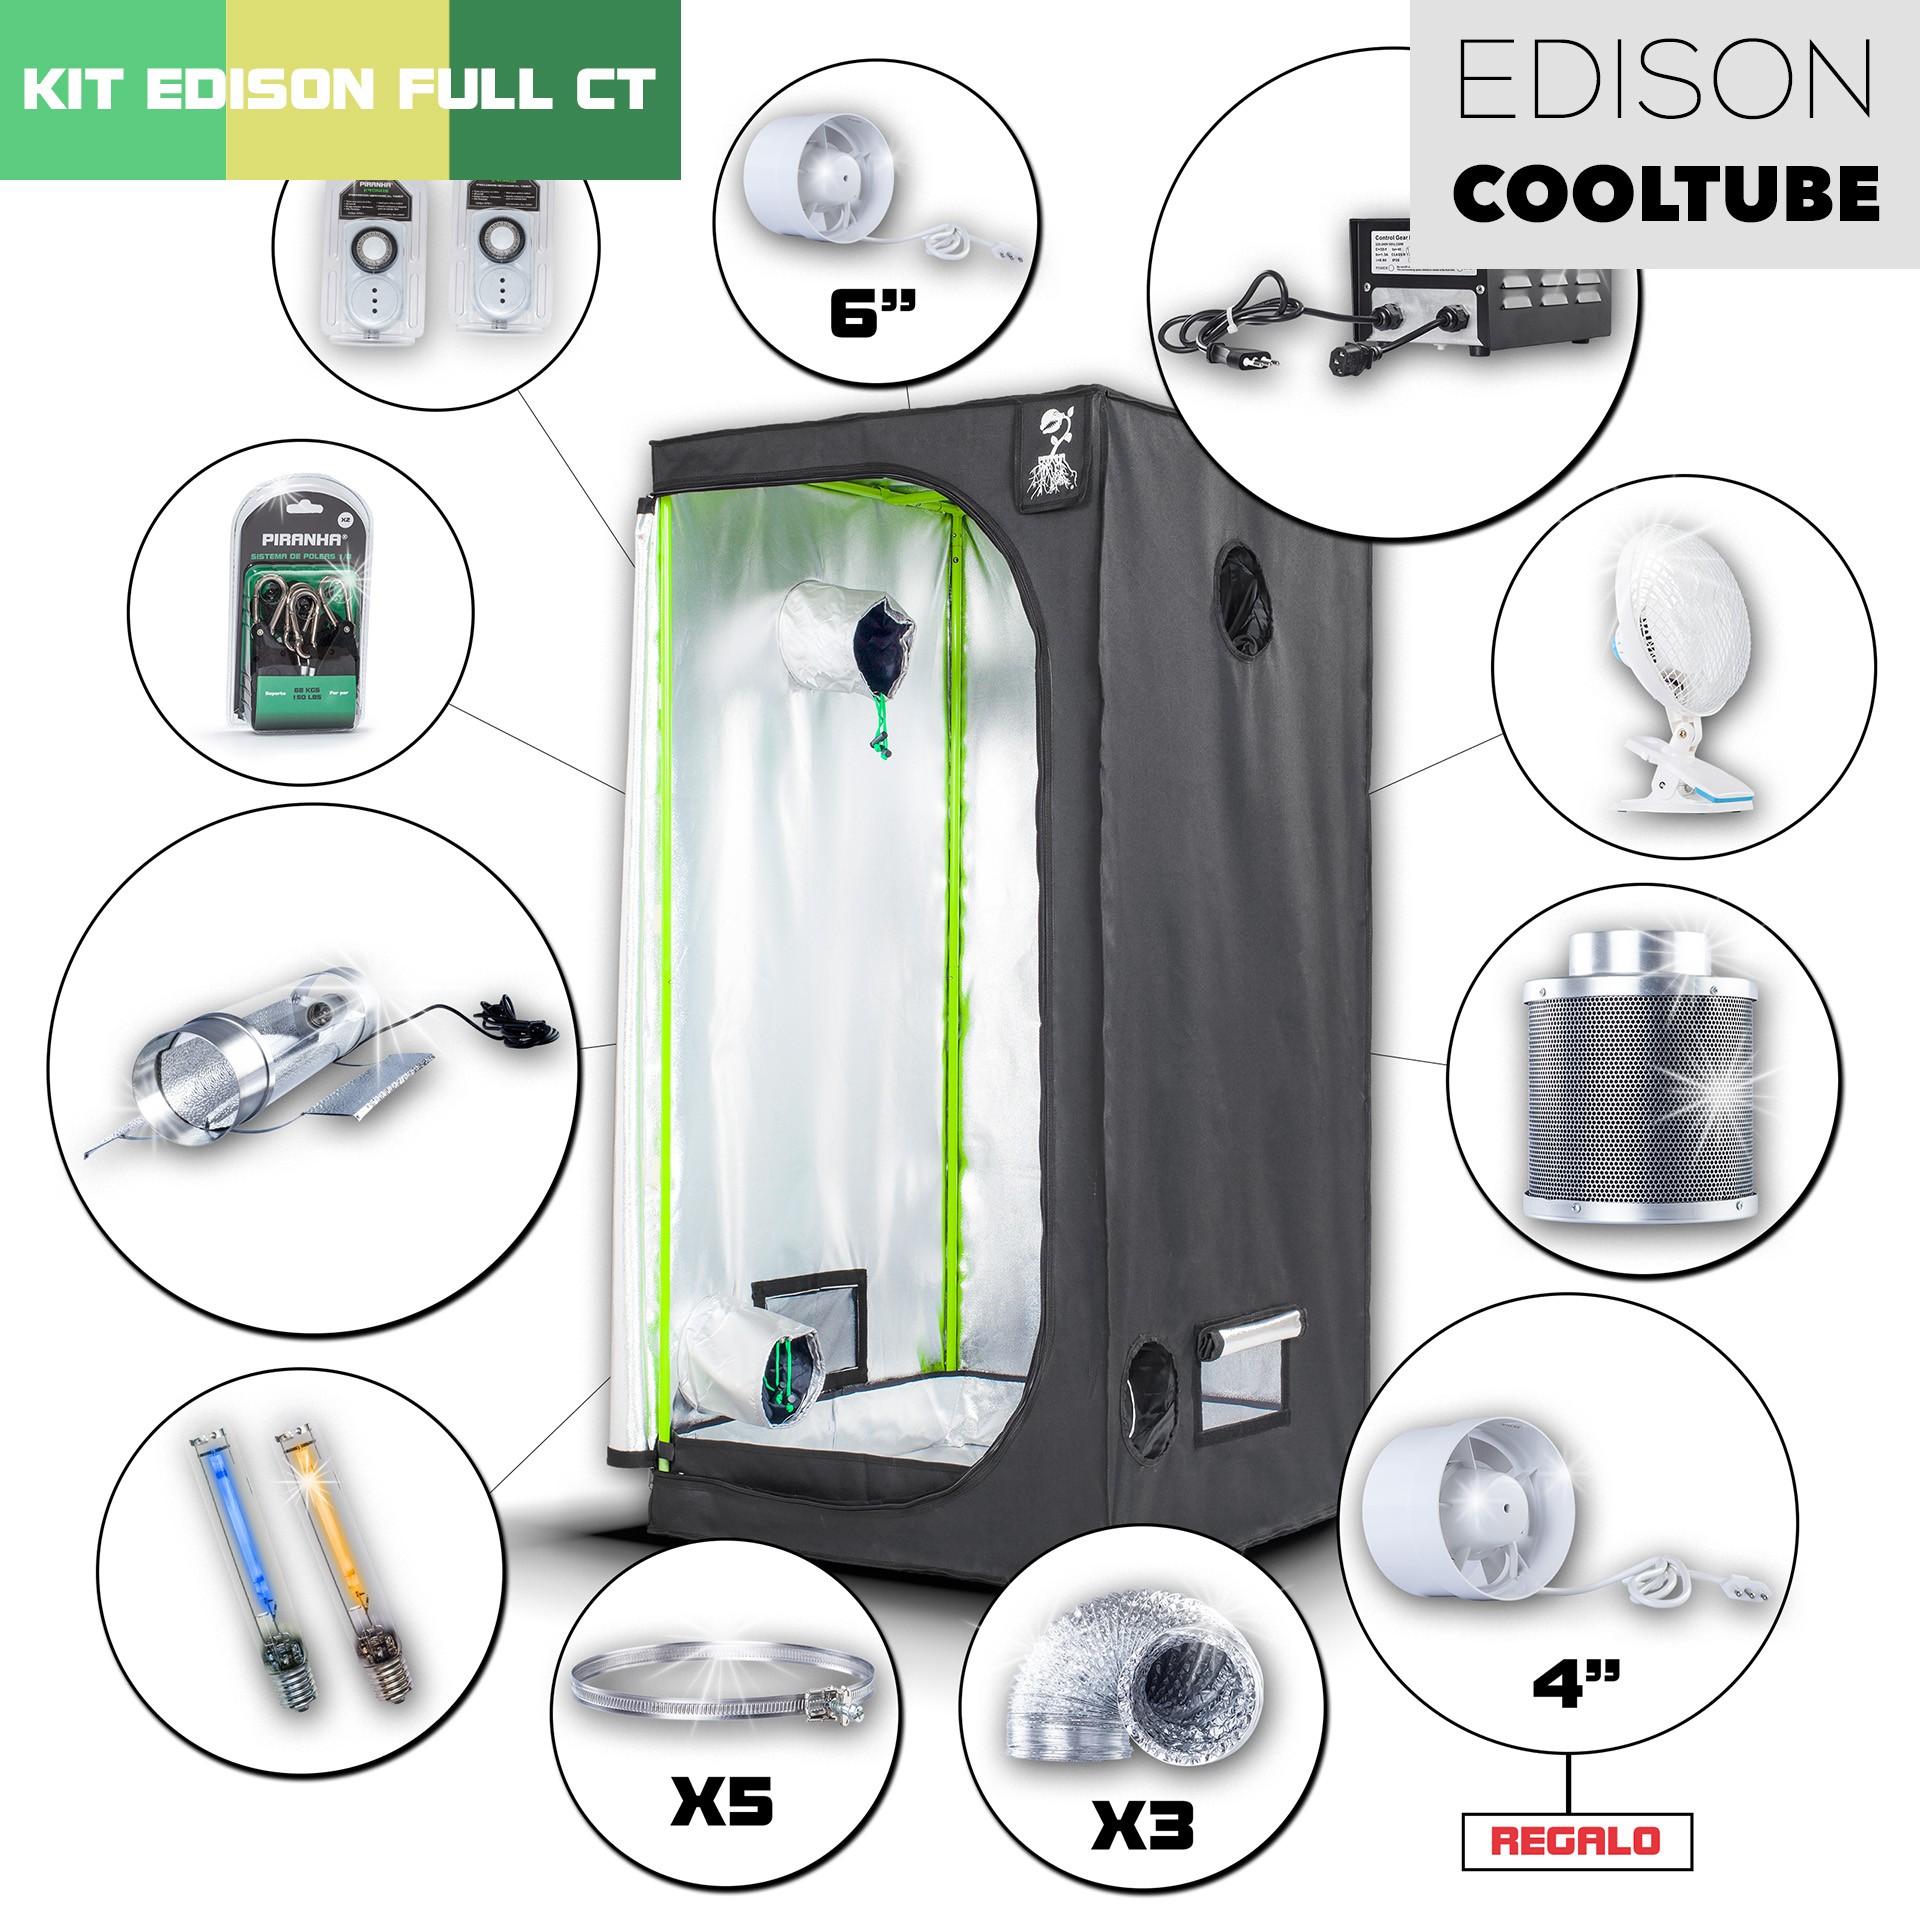 Kit CoolTube 80 - 250W Edison Completo